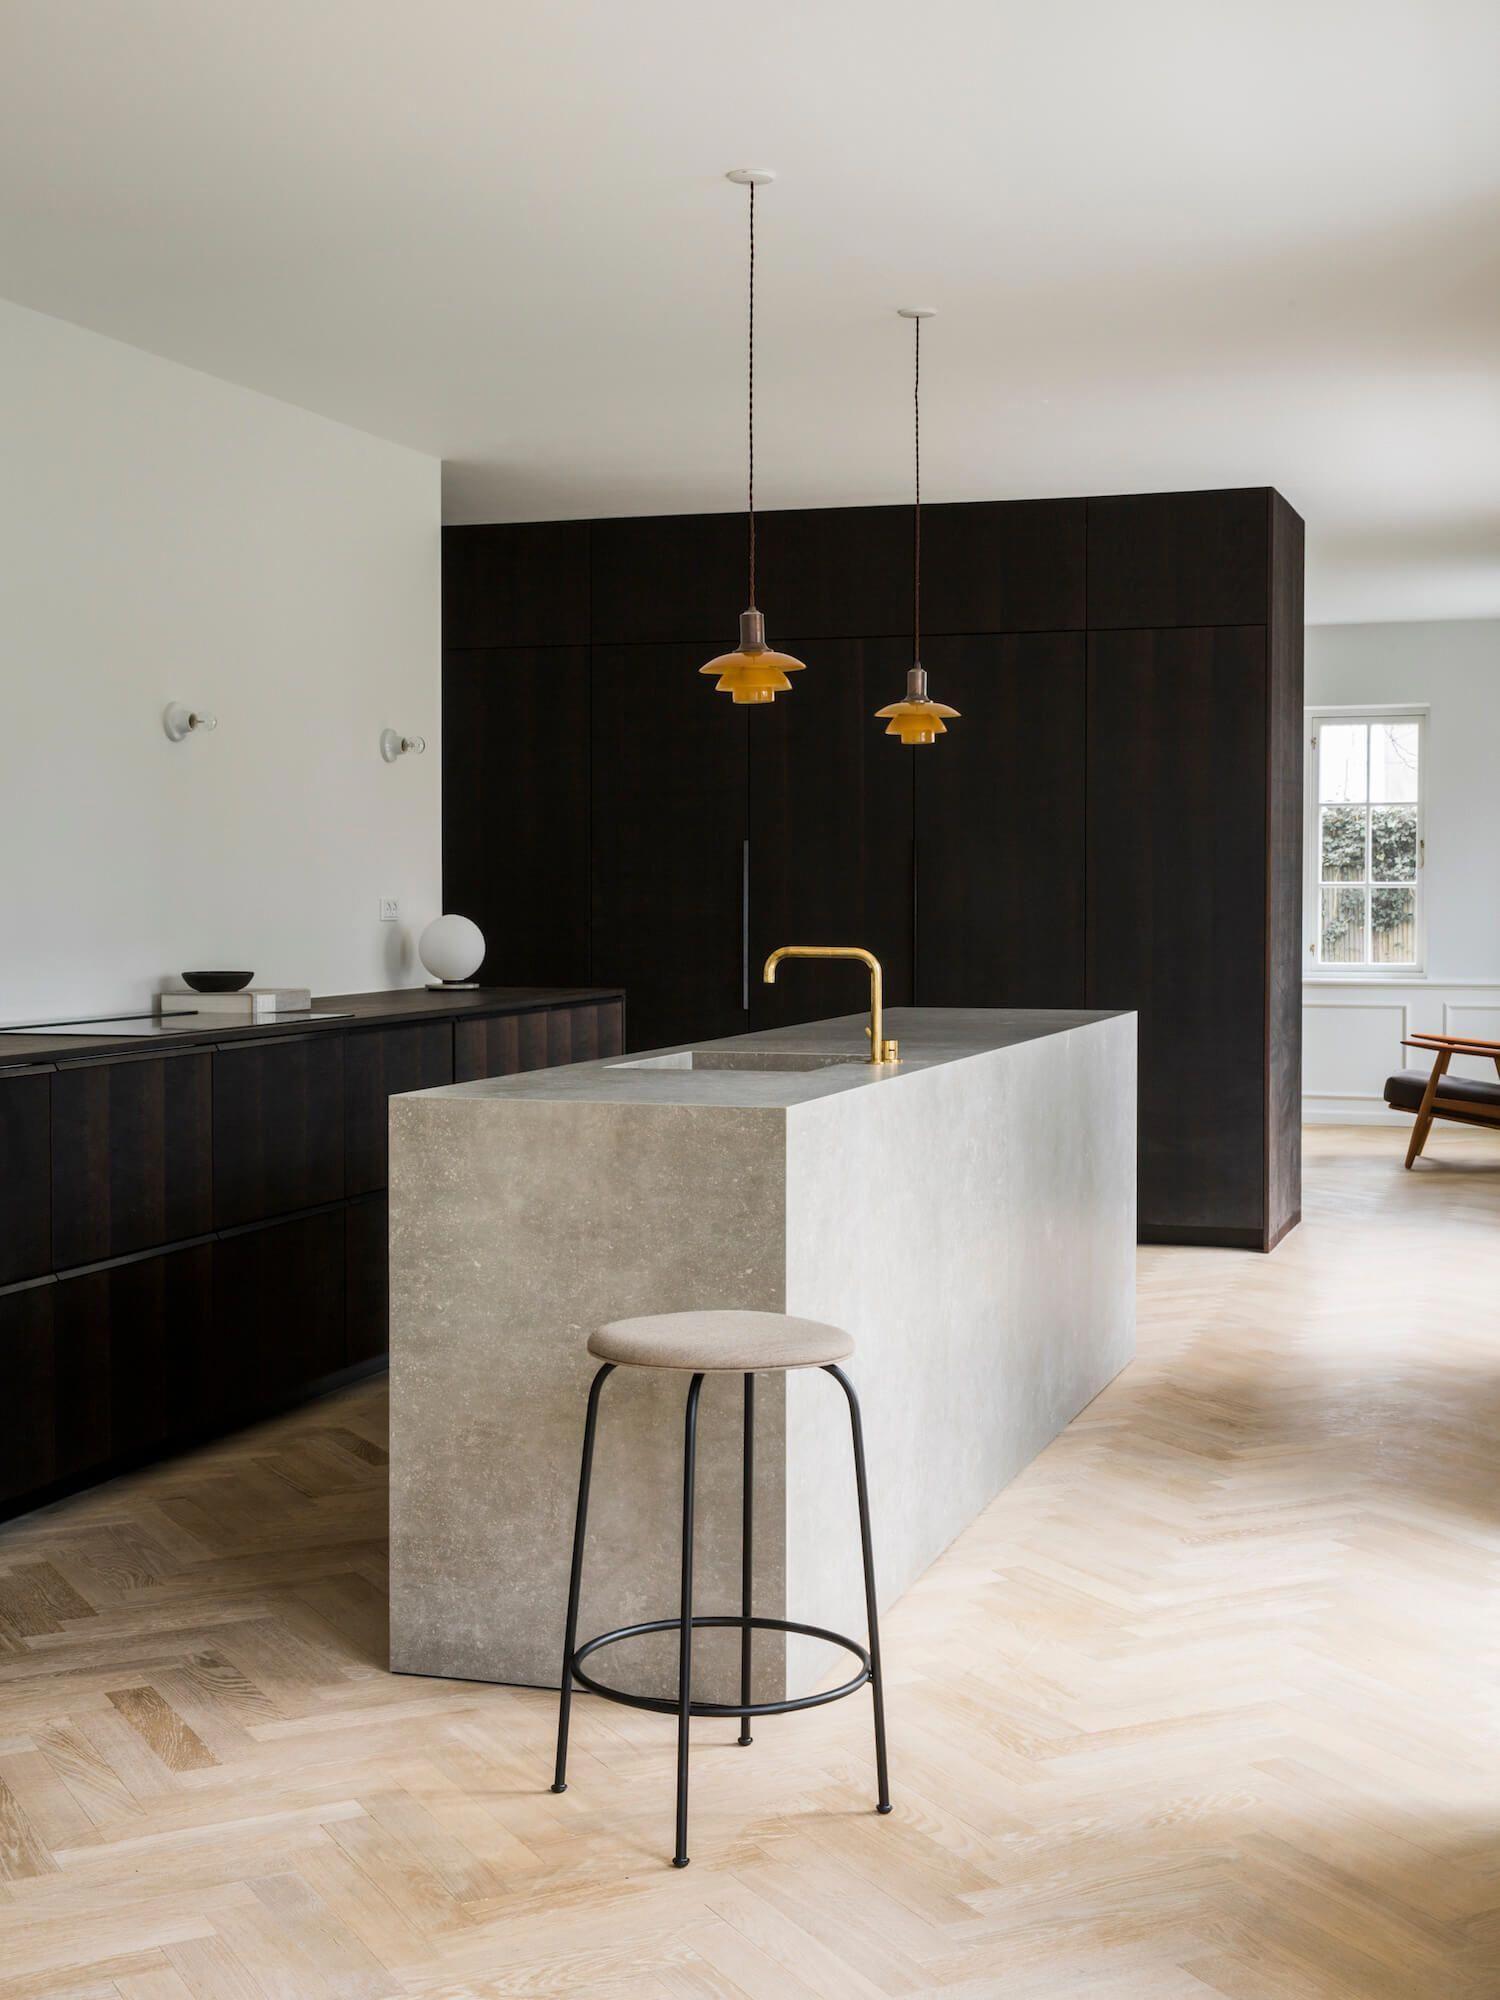 Buy Home Decorations Online #AffordableHomeDecoration